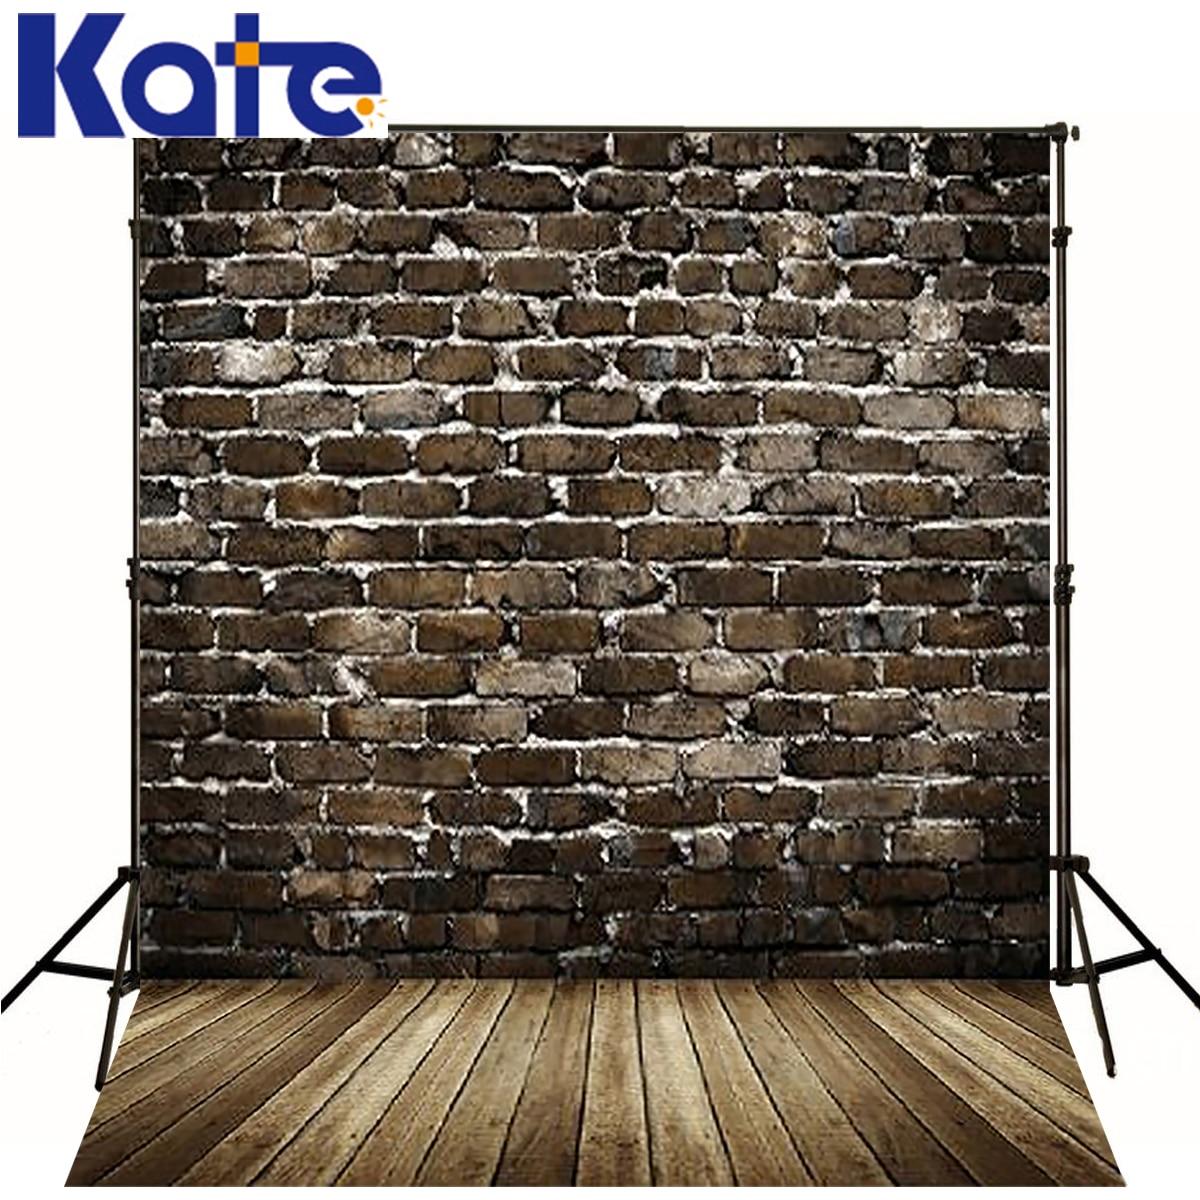 Kate Newborn Baby Fotografia Backdrops Gray Brick Wall Fondo Fotografico De Estudio Dark Wood Texture Floor Studio Backdrop<br>